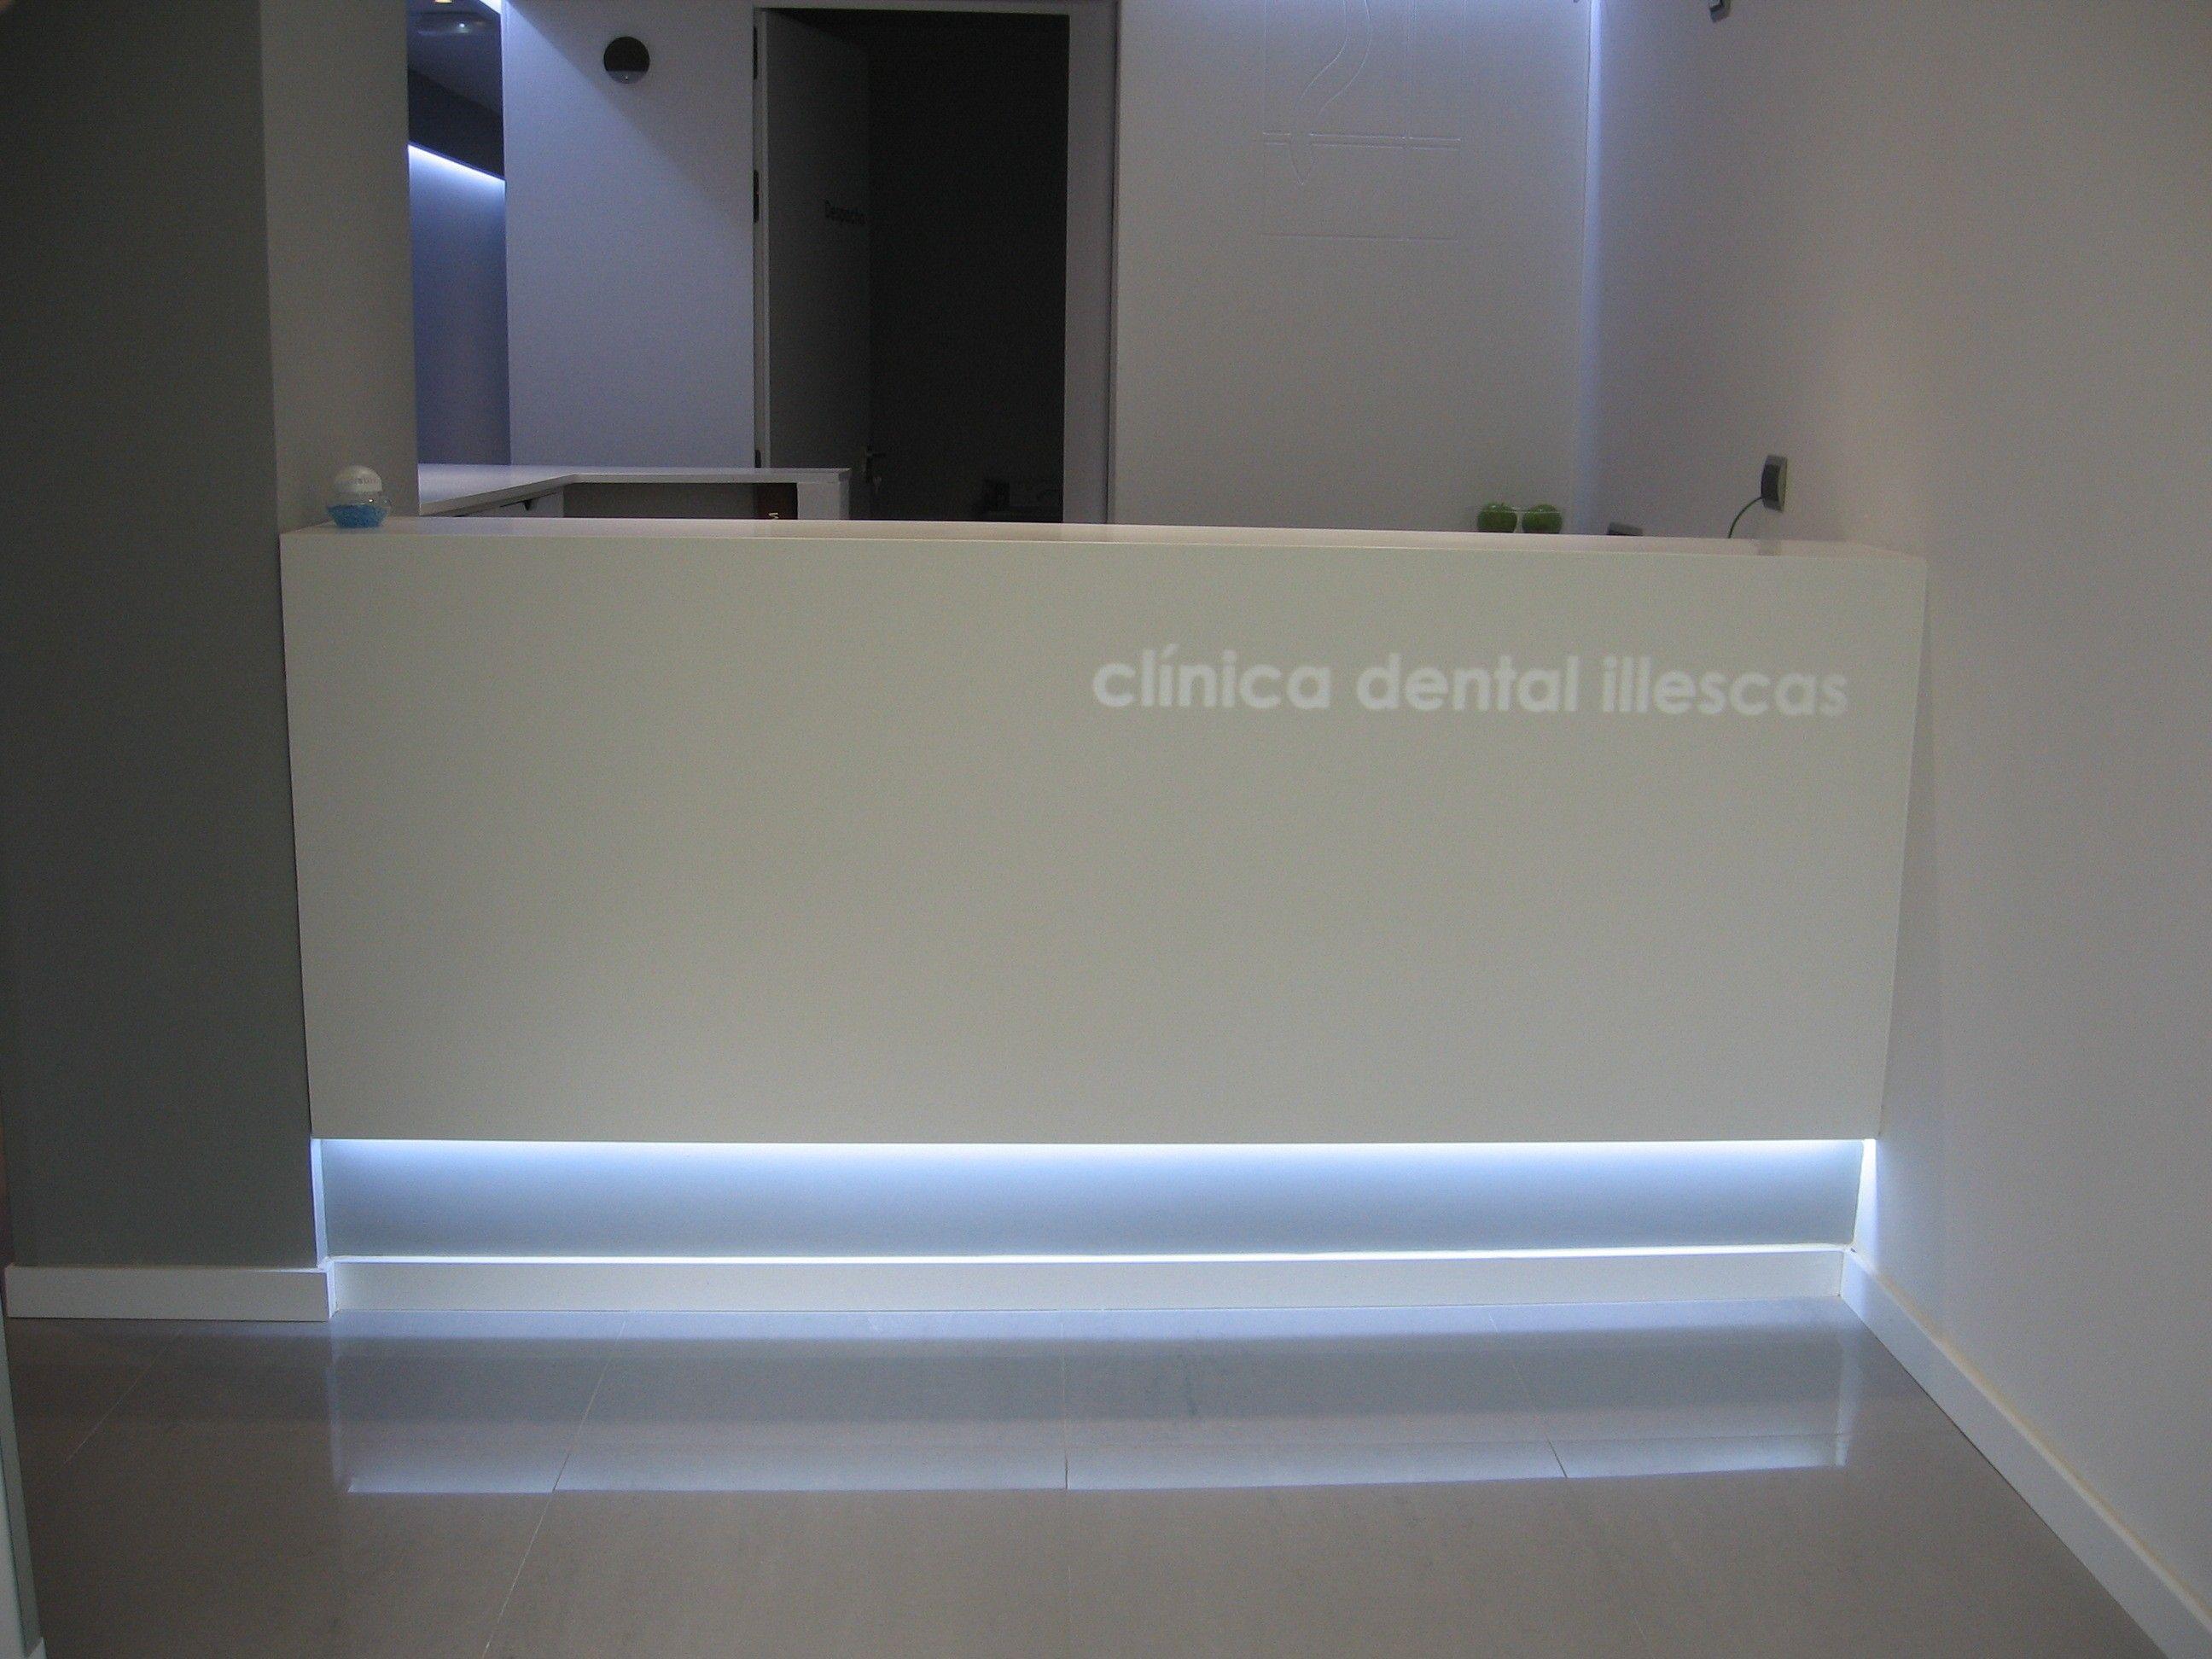 Minimalist Desk Mostrador Minimalista Fornitures Desk Bar